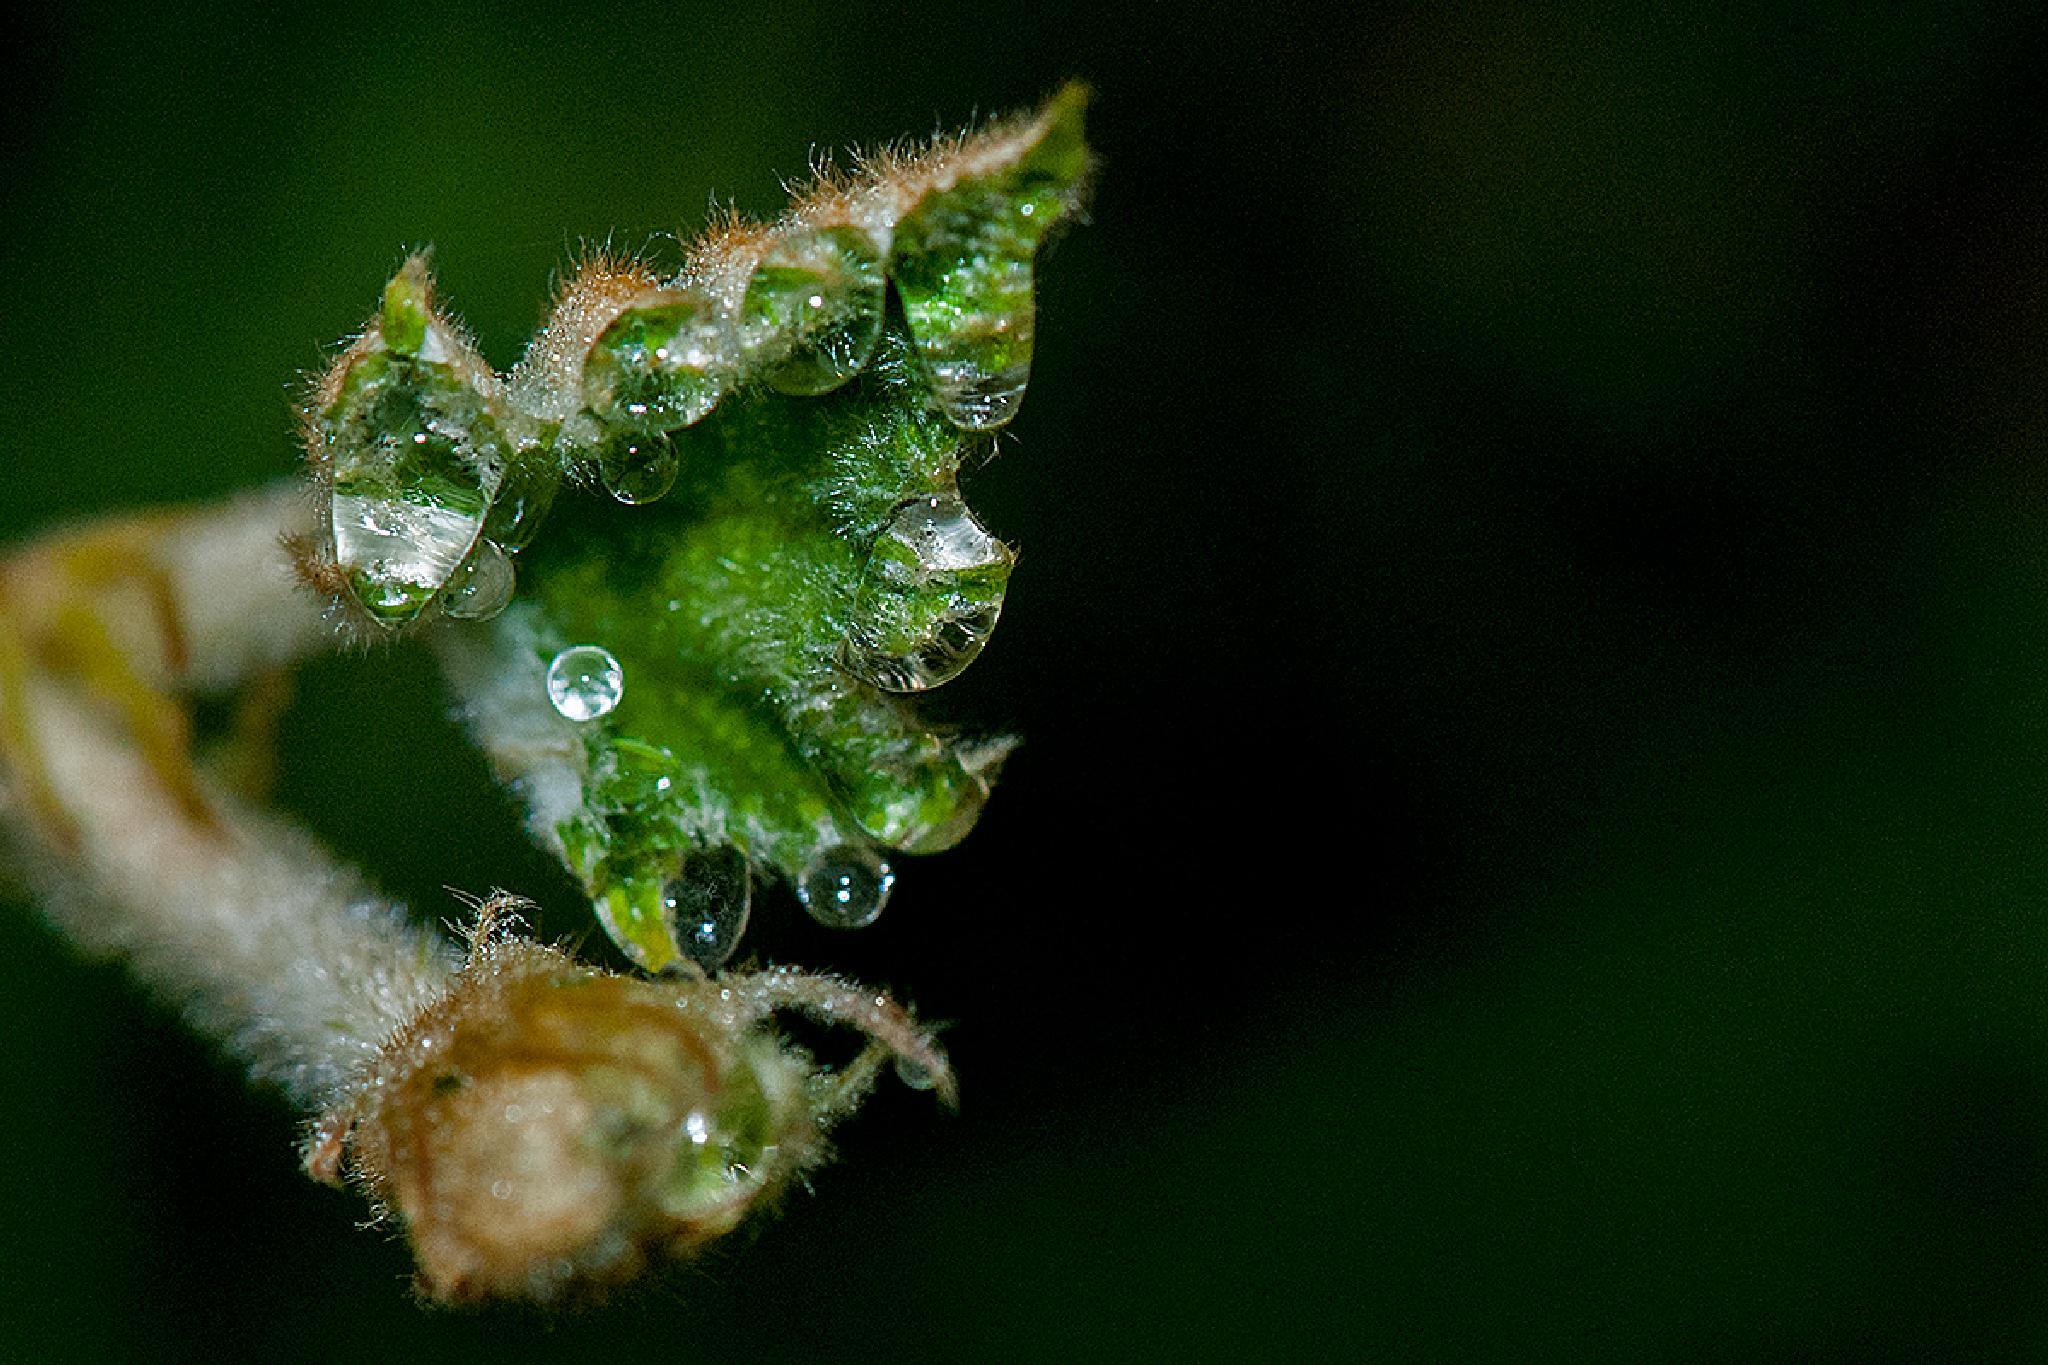 Dew drops by Girish Mayachari